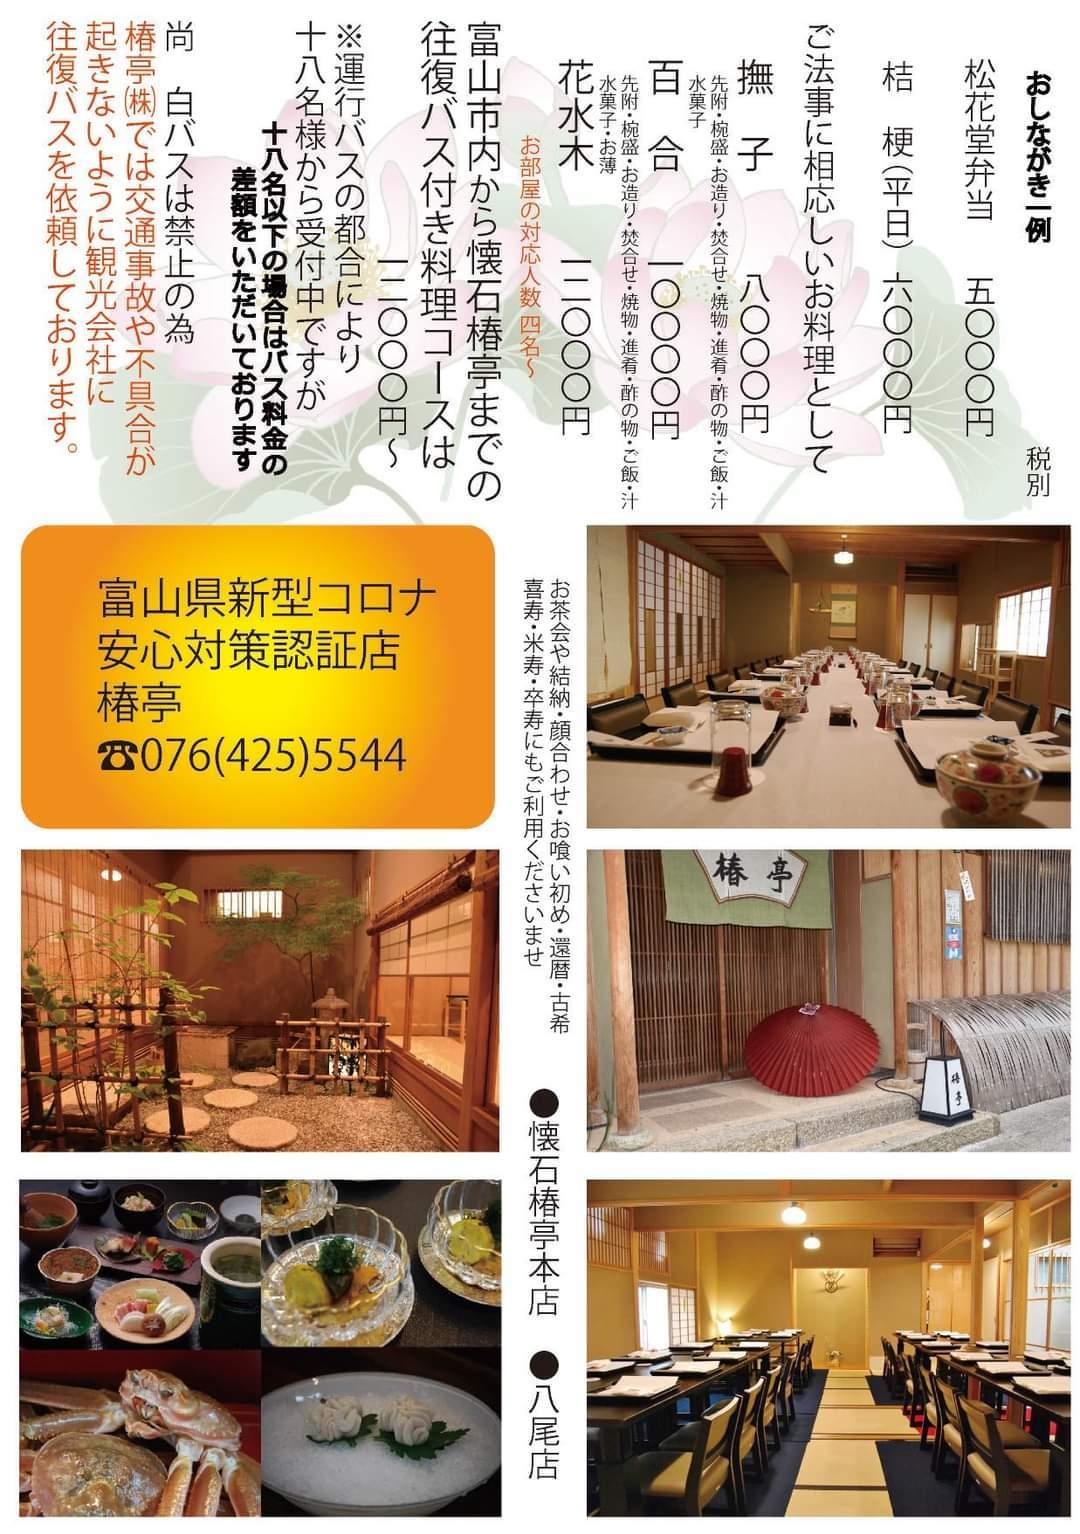 広告宣伝 富山県新型コロナ安心対策認証店_d0377709_12263945.jpg